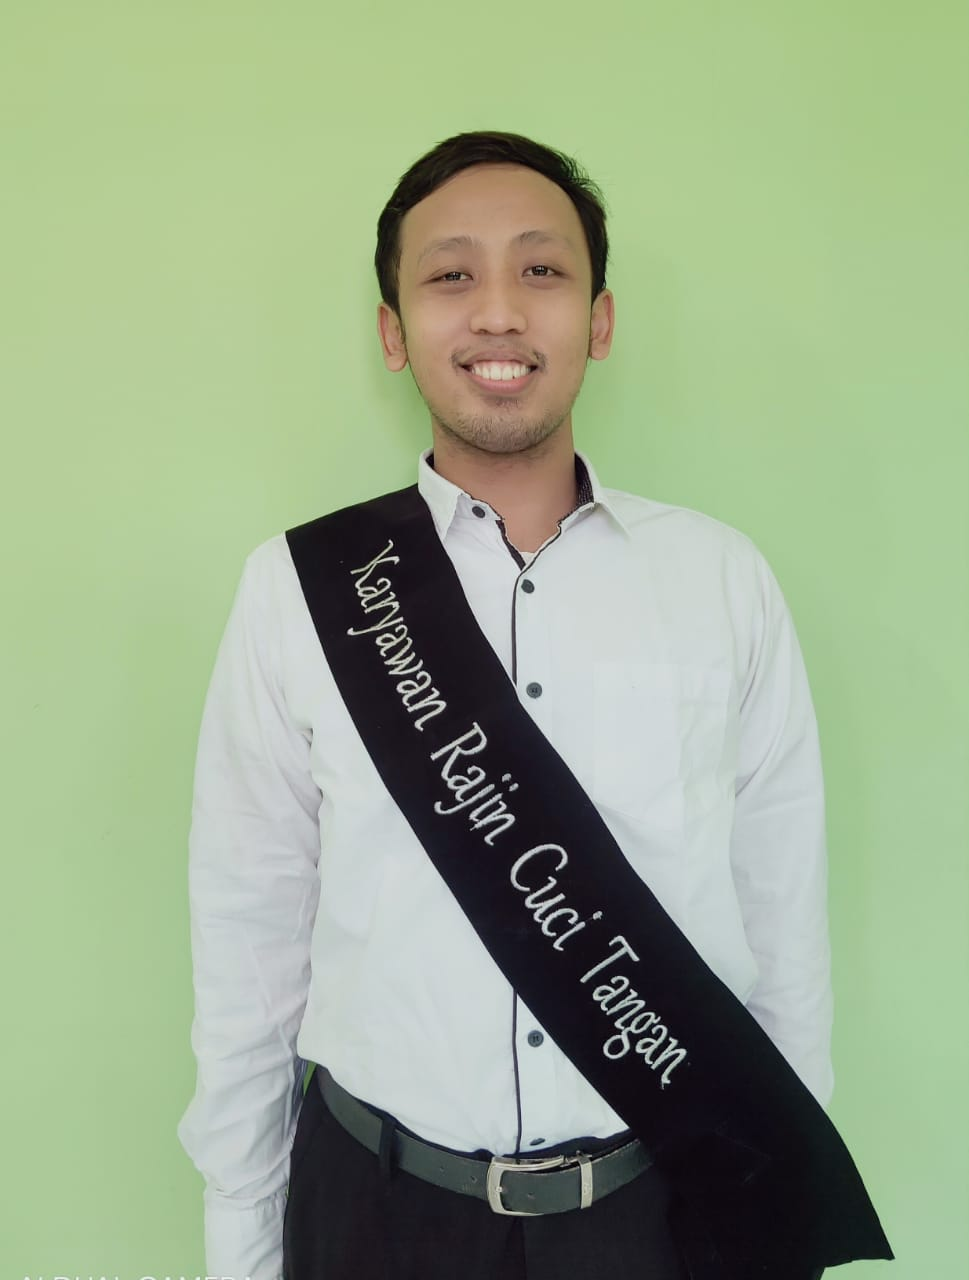 Karyawan Rajin Cuci Tangan Dengan Benar (Kamal Burhanuddin, A.Md.)